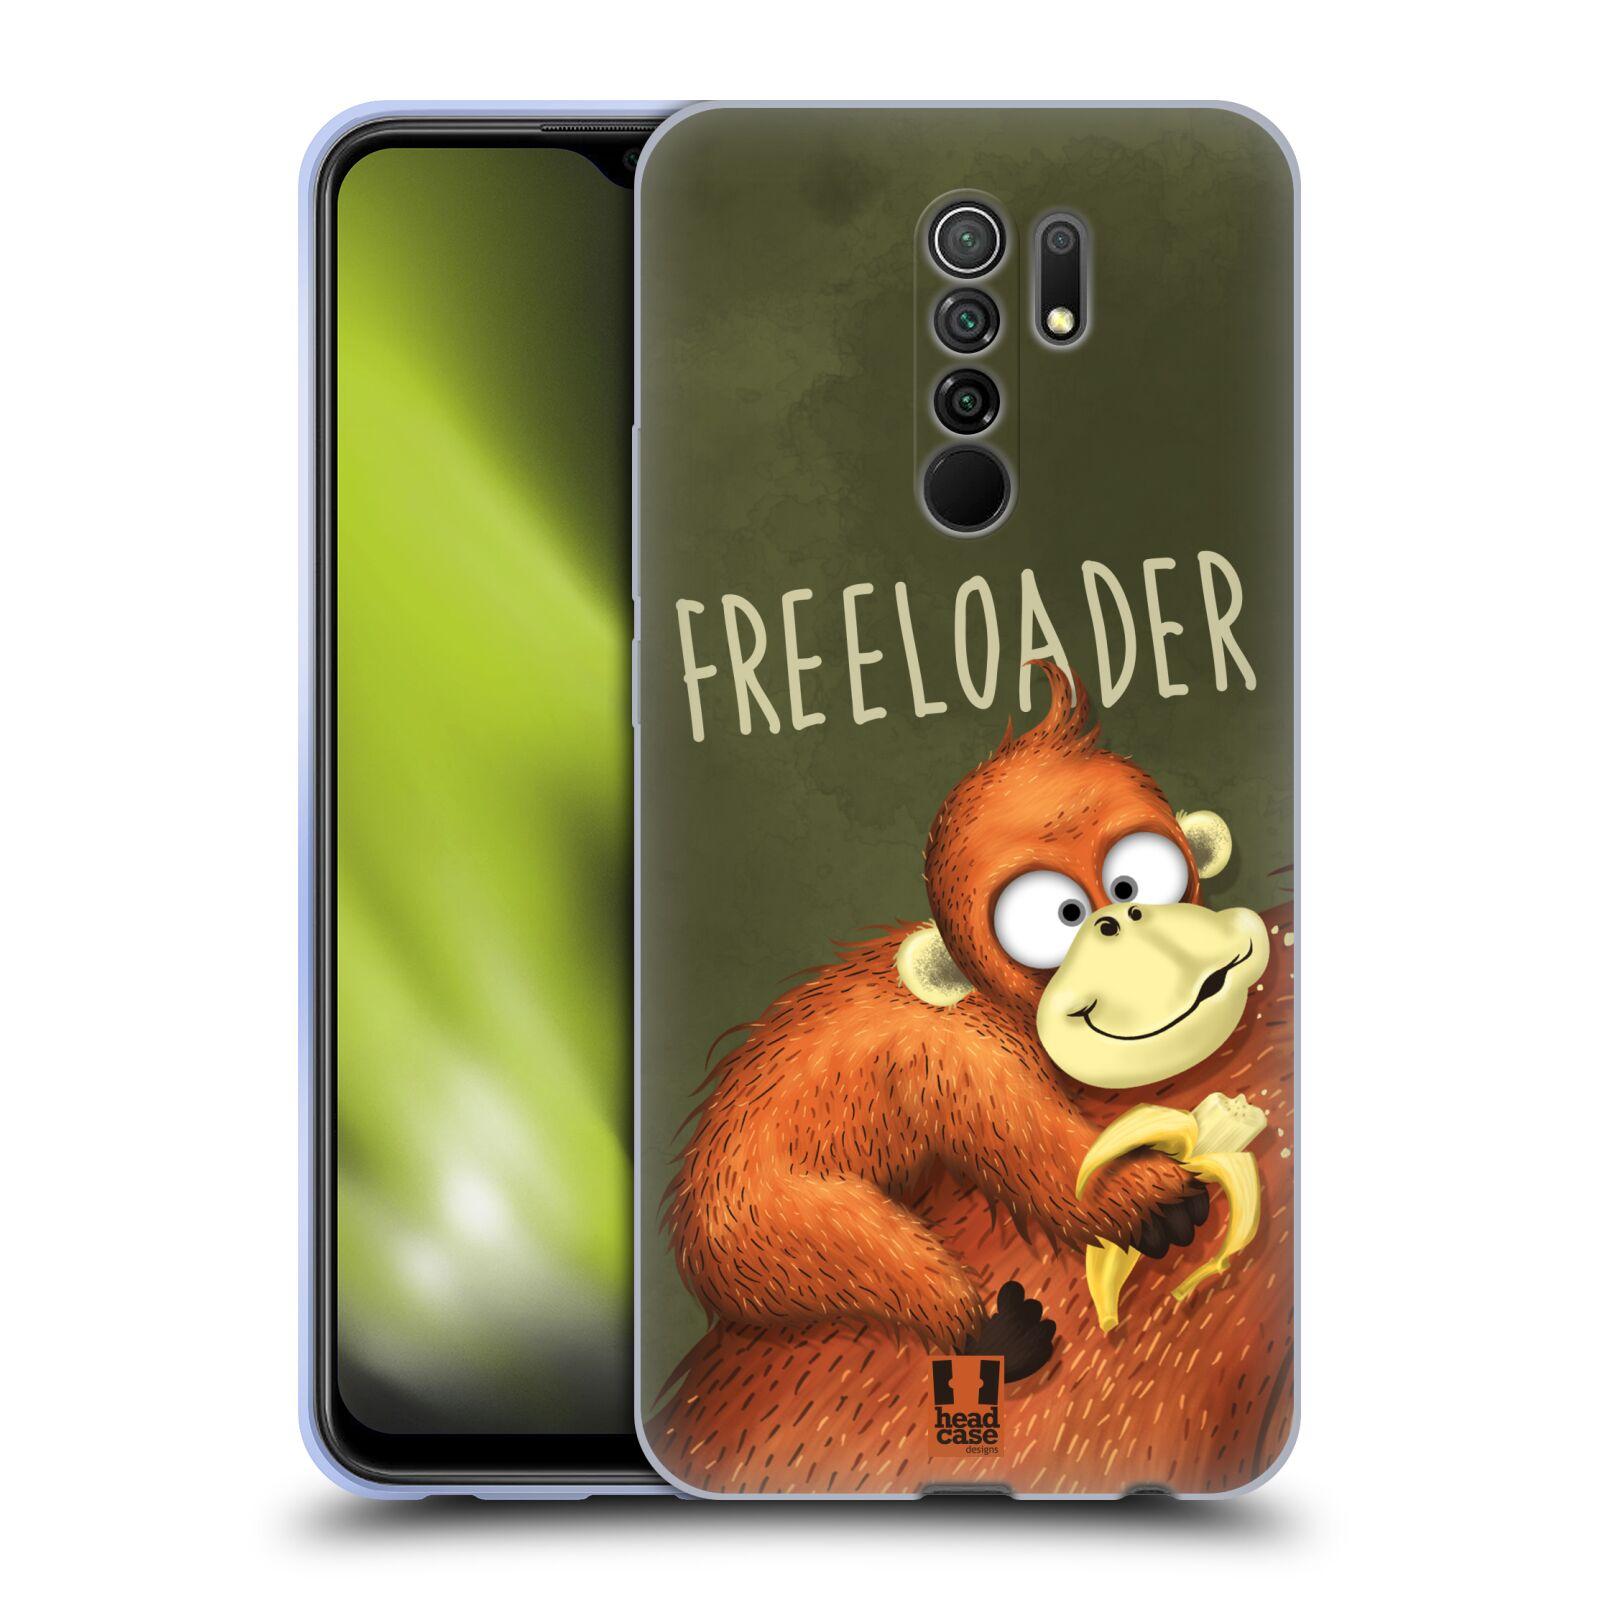 Silikonové pouzdro na mobil Xiaomi Redmi 9 - Head Case - Opičák Freeloader